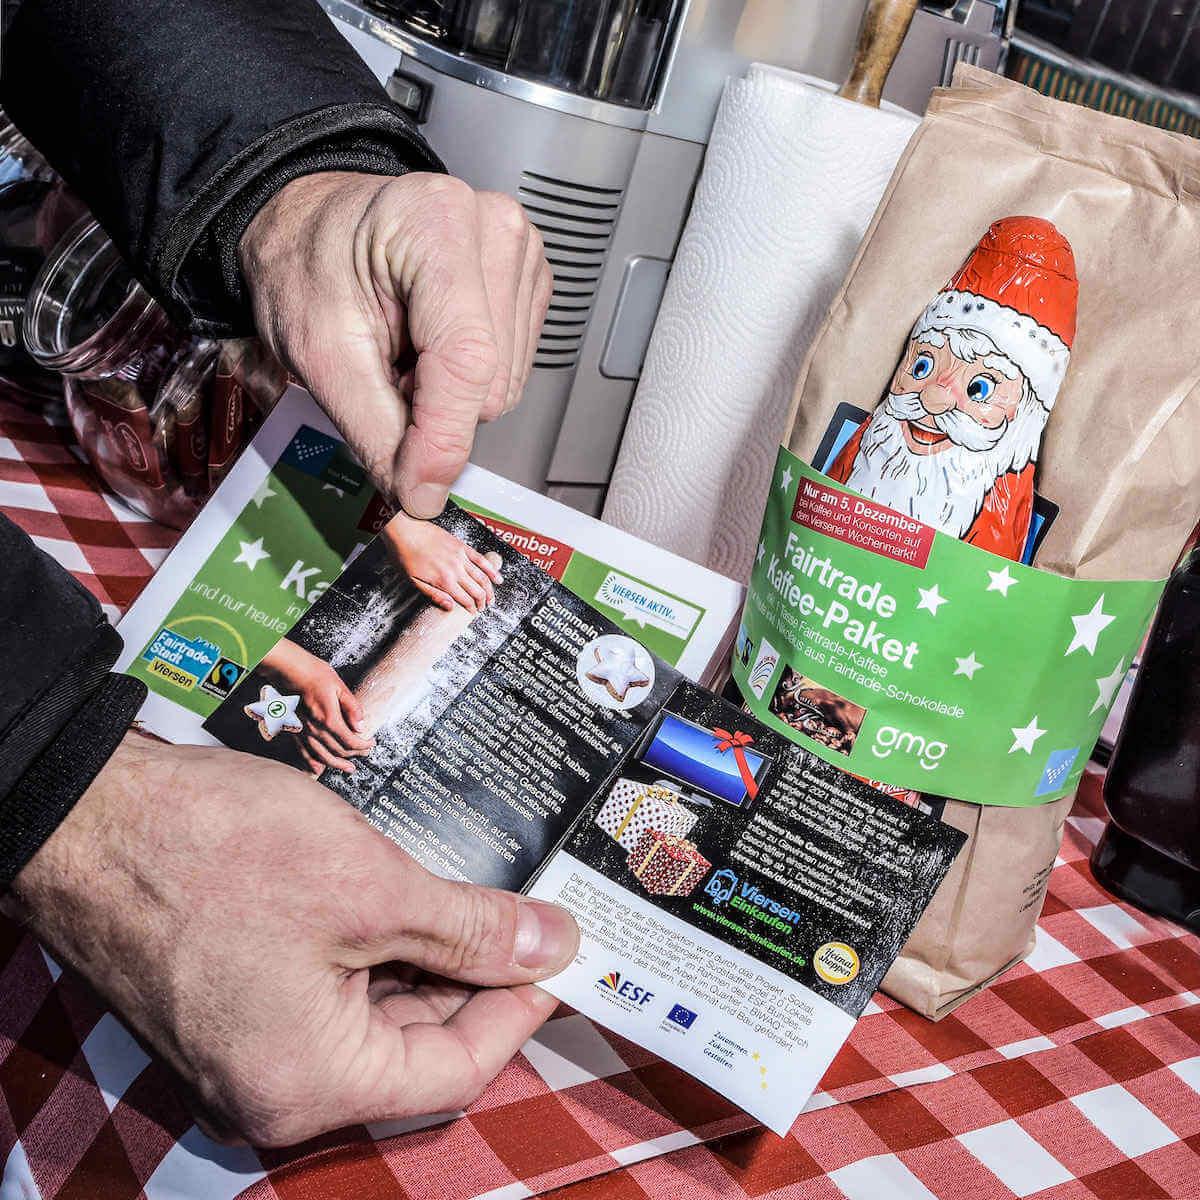 Aktion Fairtrade & Sticker Flyer